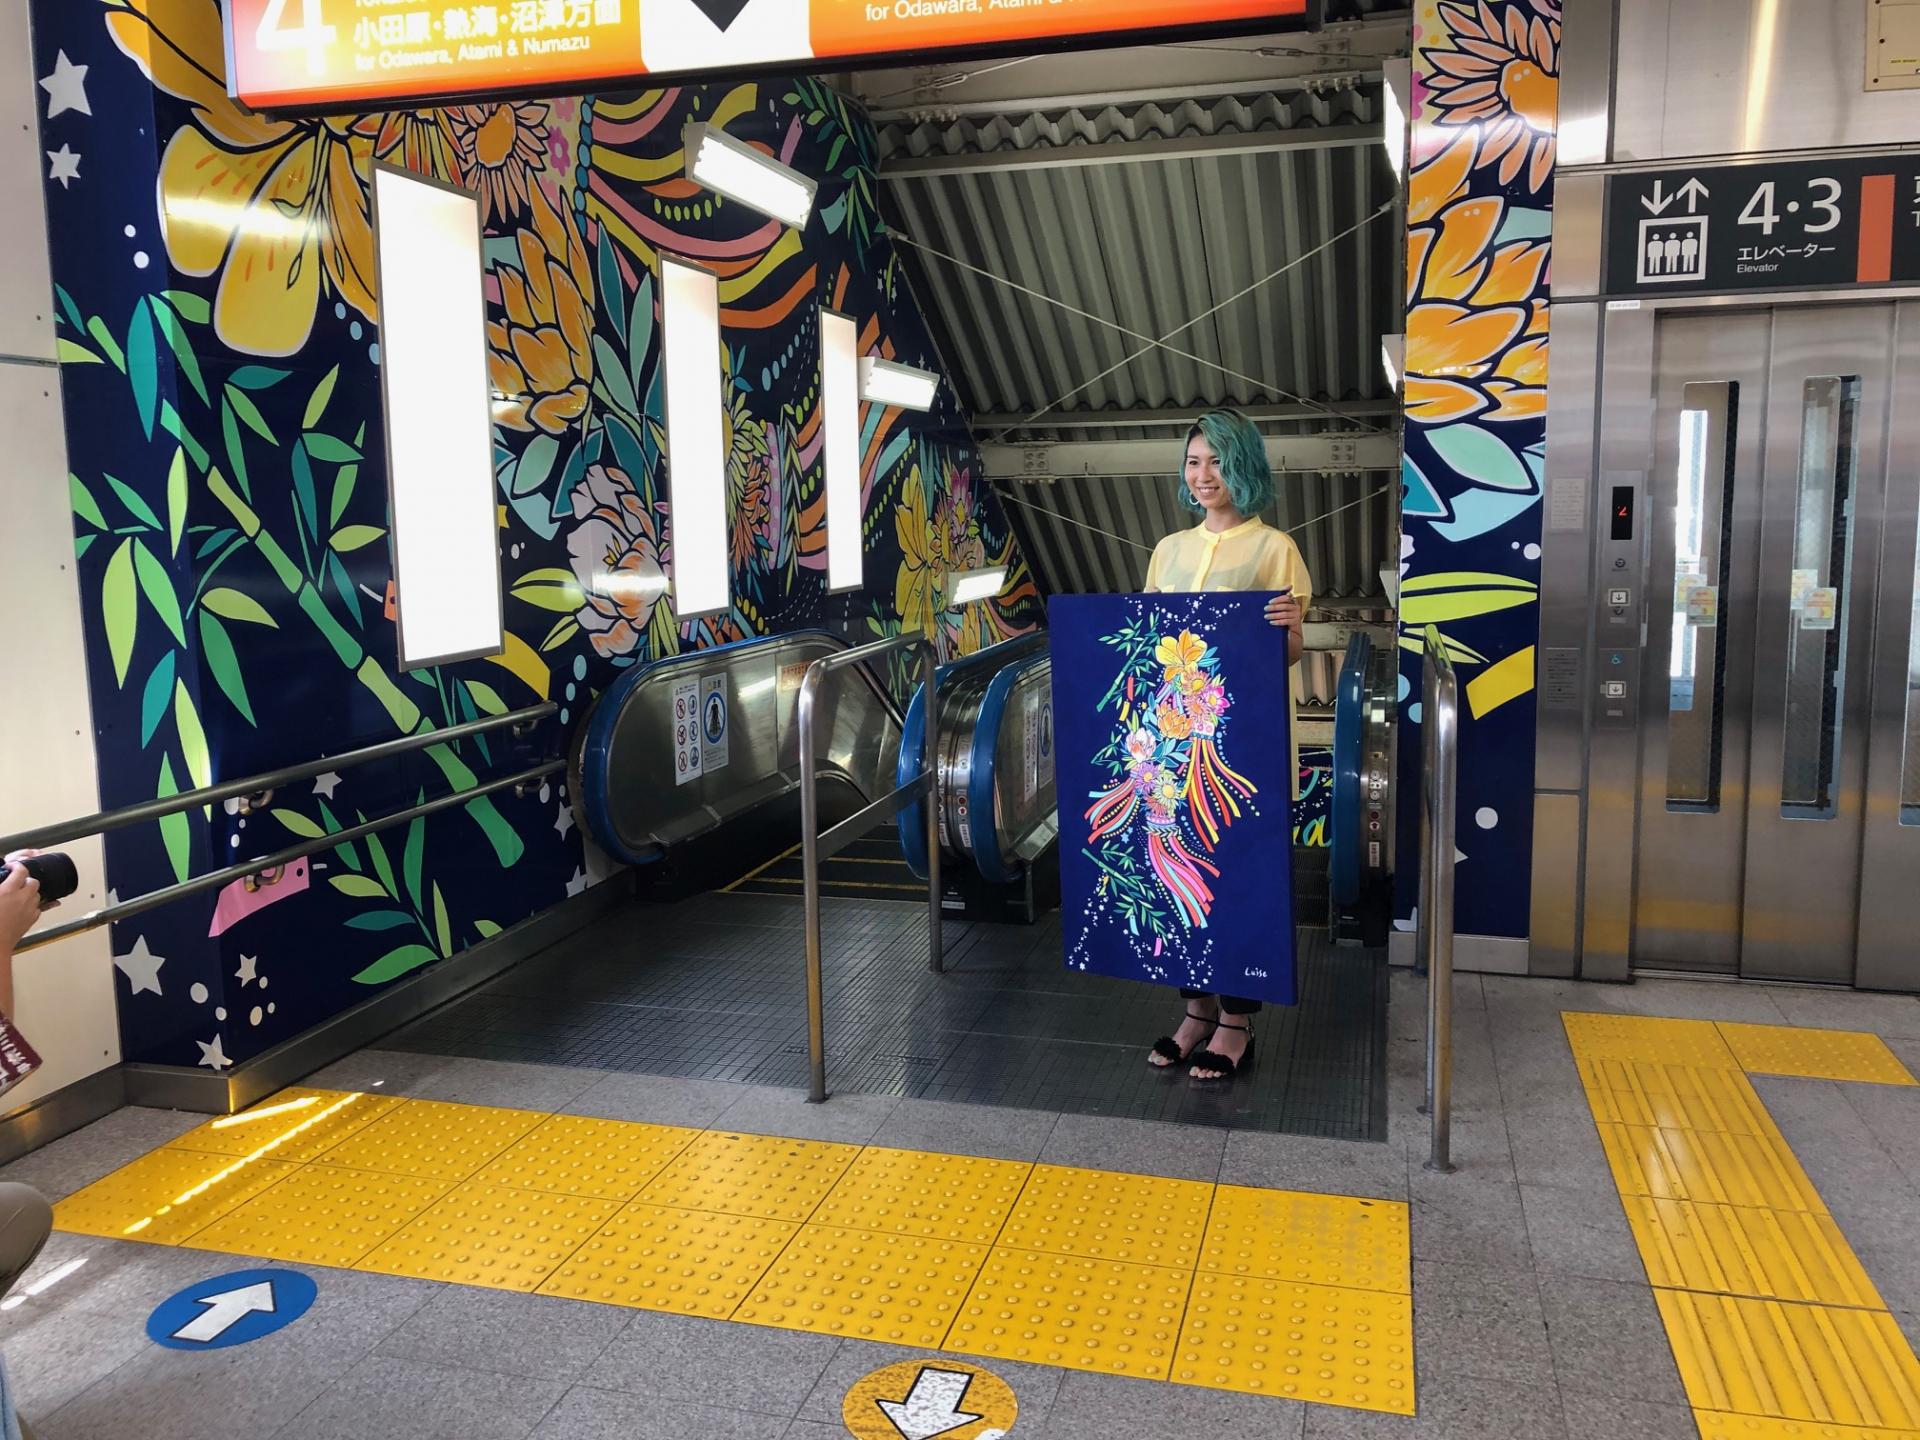 JR東海道本線平塚駅構内エスカレーター壁面のラッピングが完成